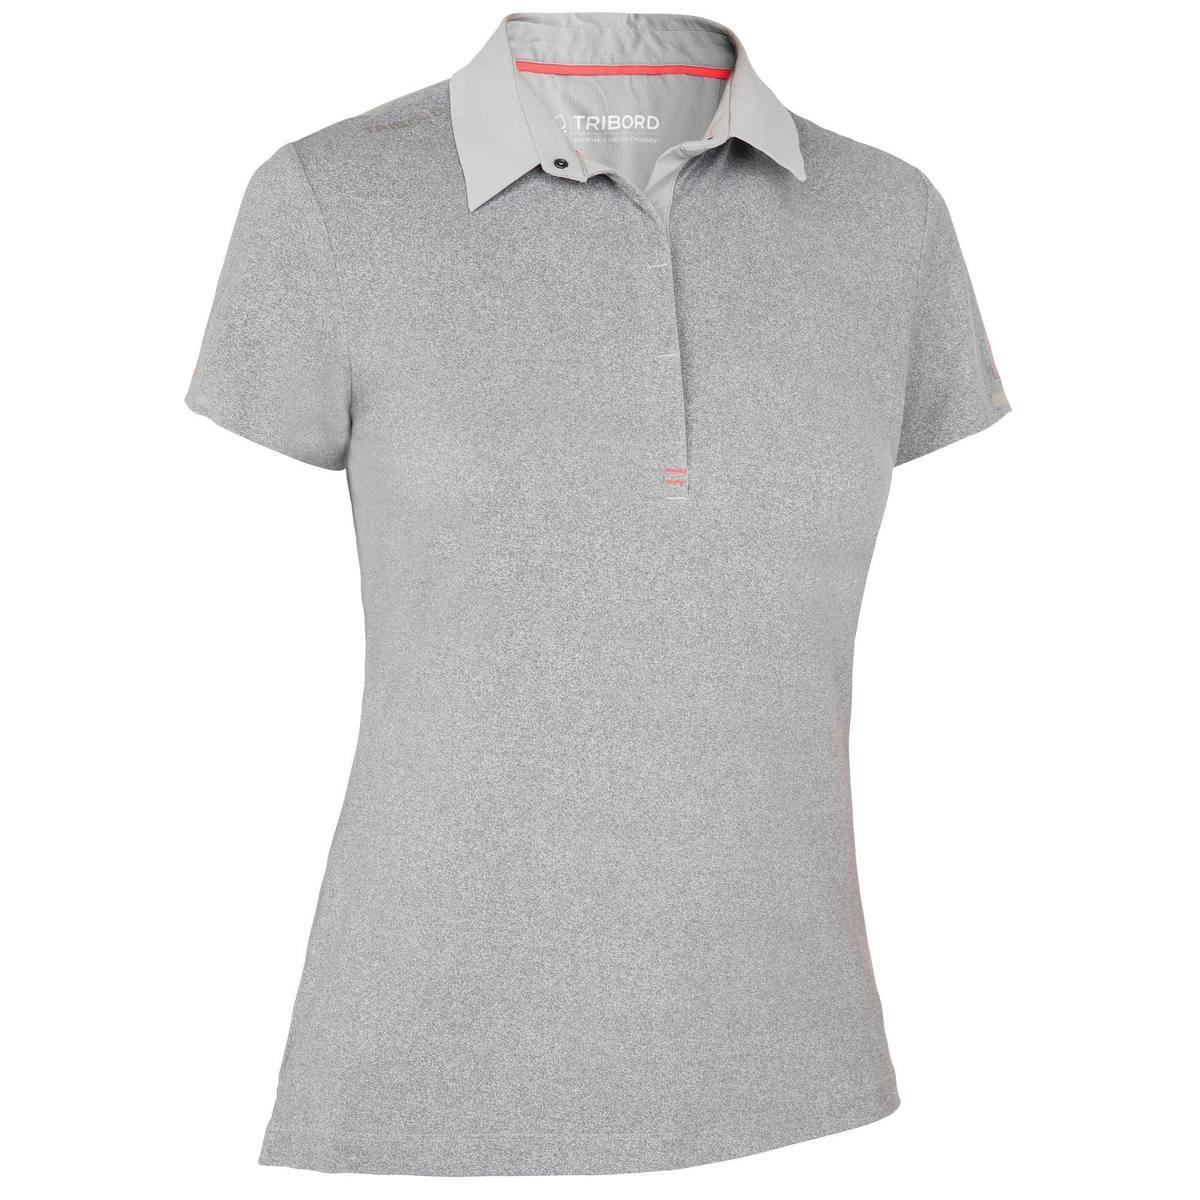 Bild 1 von Poloshirt kurzarm Segeln Race Damen grau